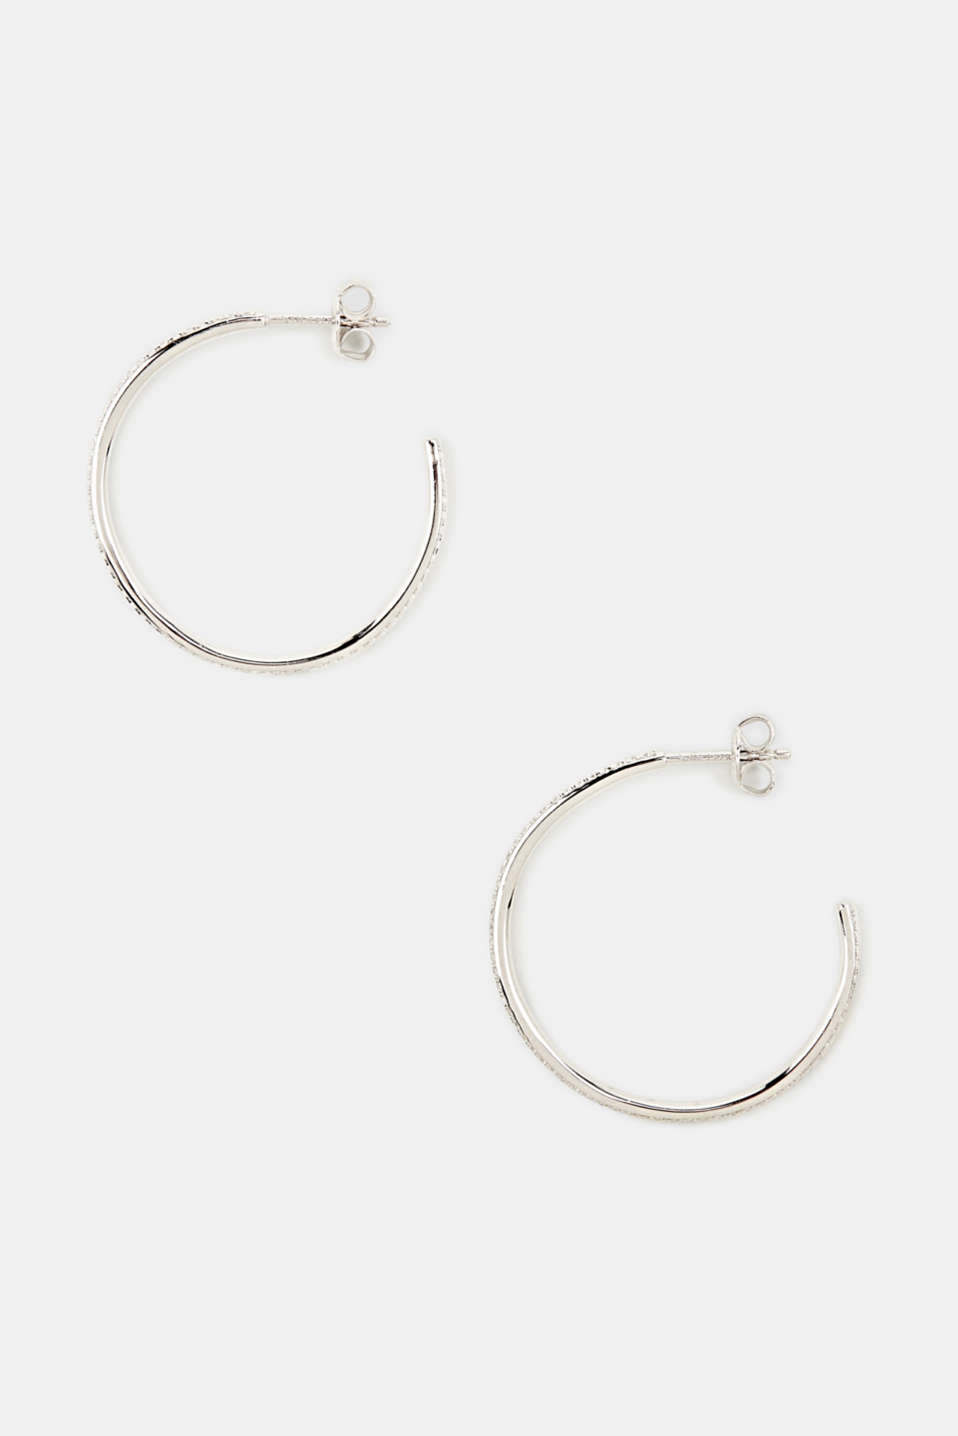 Hoop earrings with zirconia, sterling silver, LCSILVER, detail image number 0